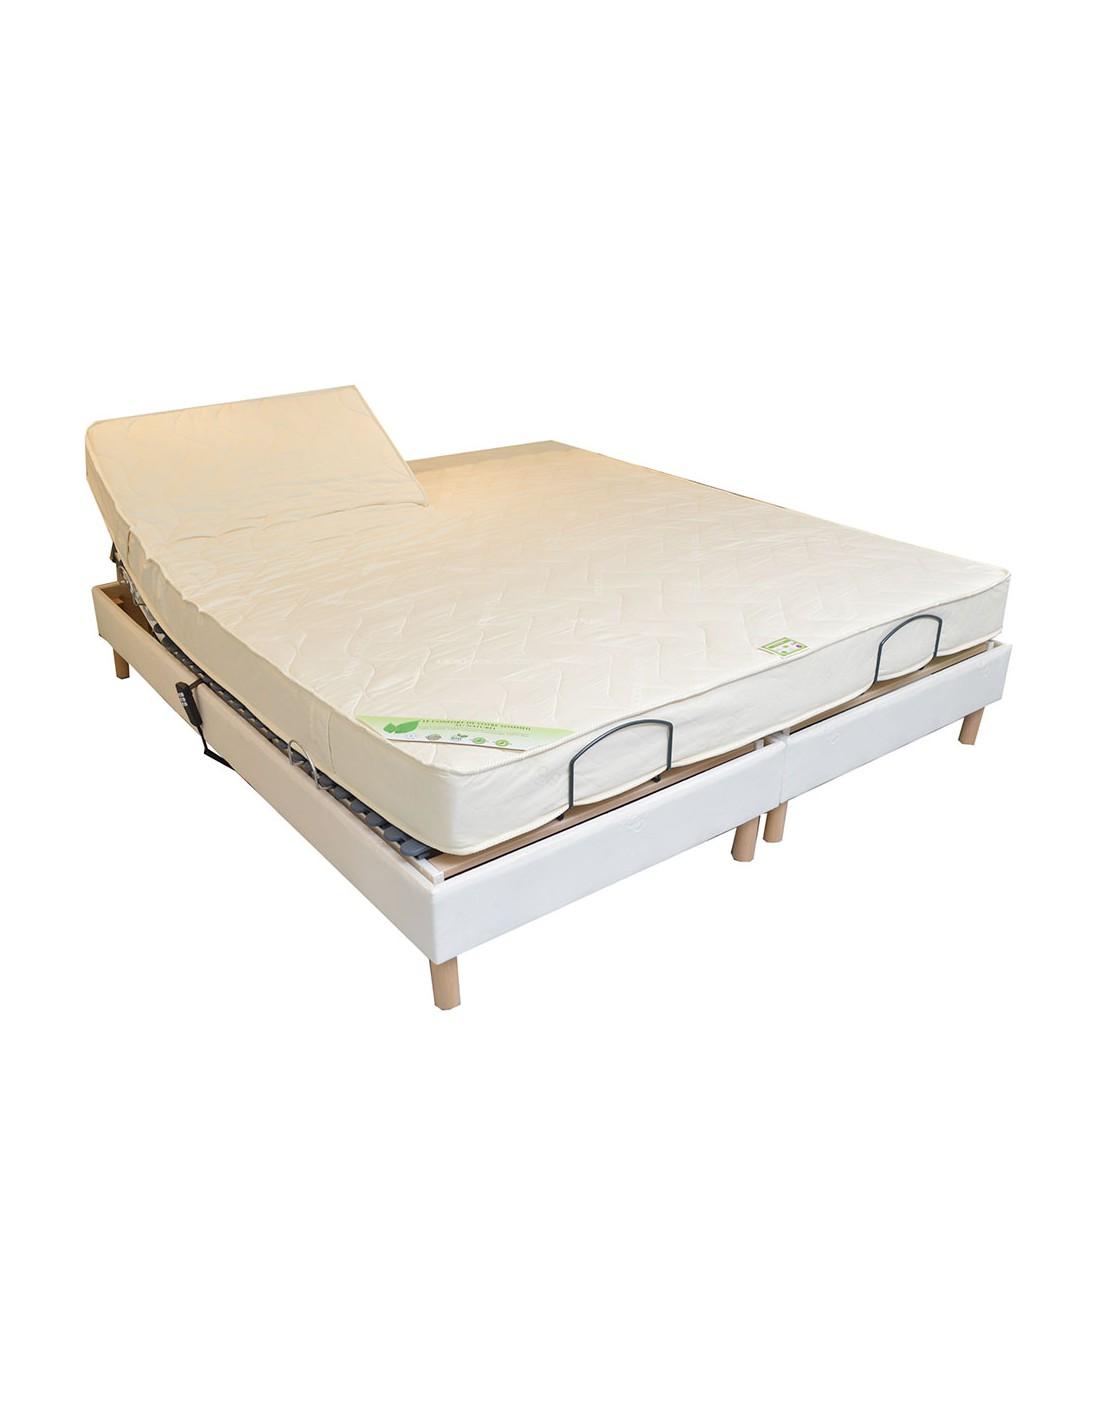 matelas bio latex de relaxation 160x190 bi t te naturel l gance ferme 18 cm. Black Bedroom Furniture Sets. Home Design Ideas